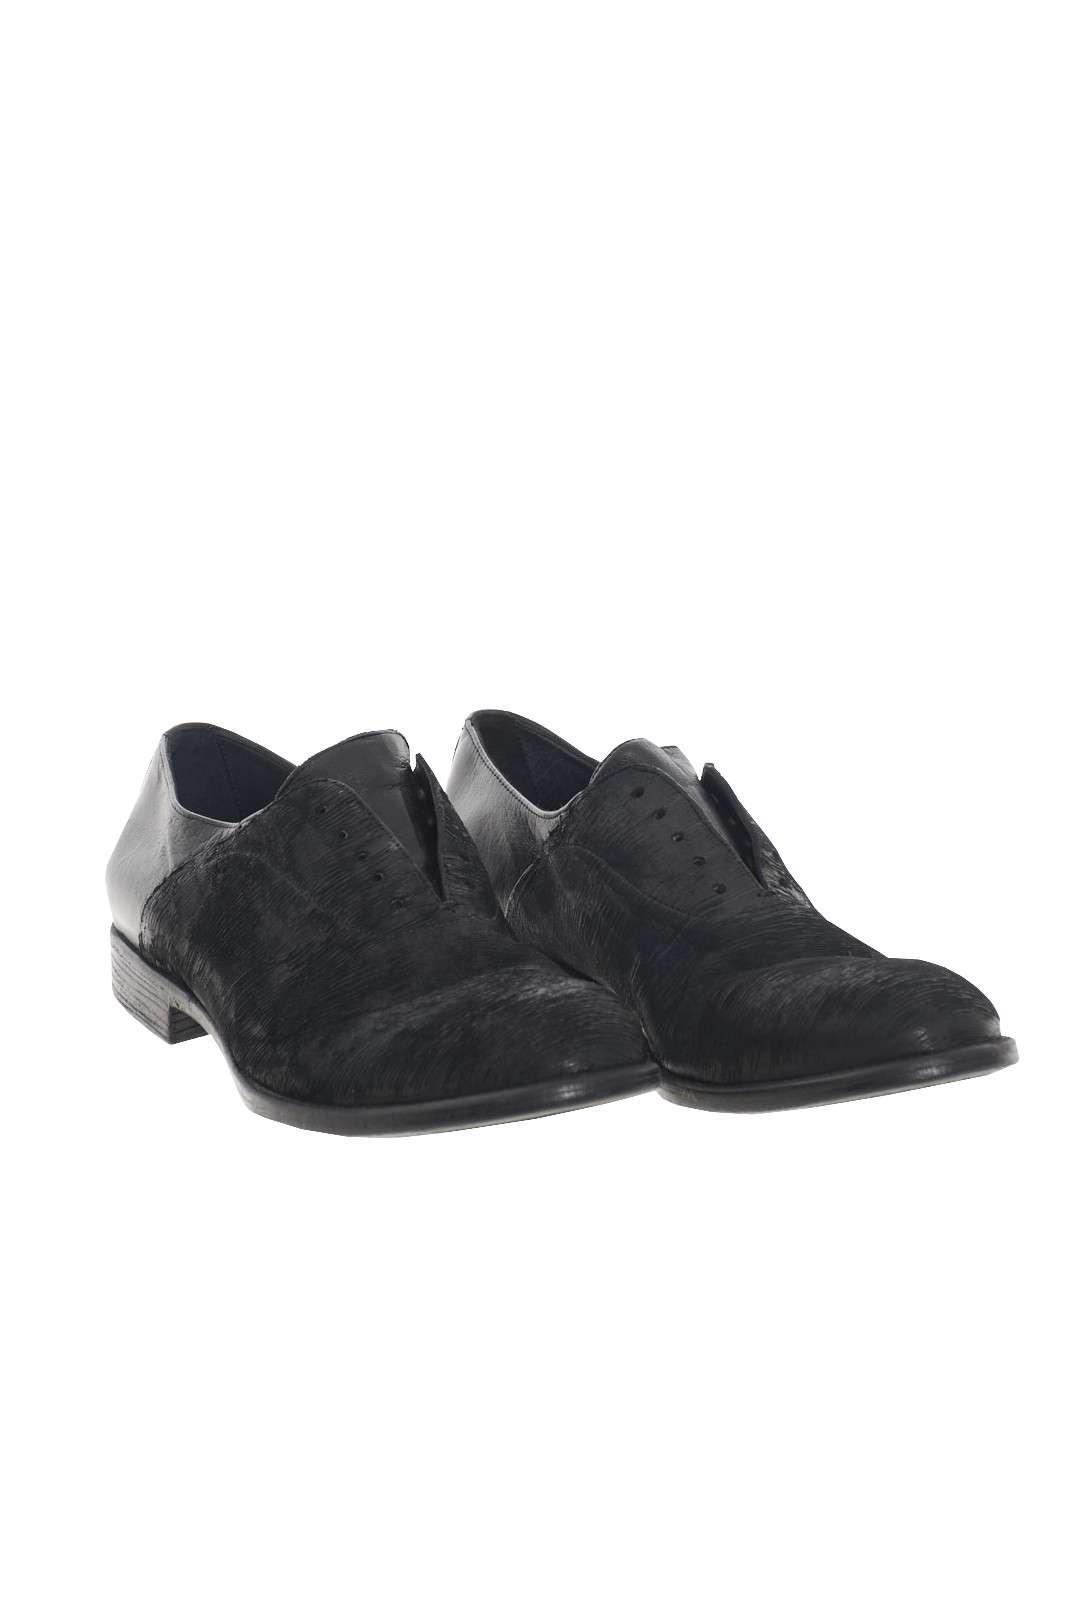 https://www.parmax.com/media/catalog/product/a/i/AI-outlet_parmax-scarpe-uomo-Hundred-100-M087-D.jpg